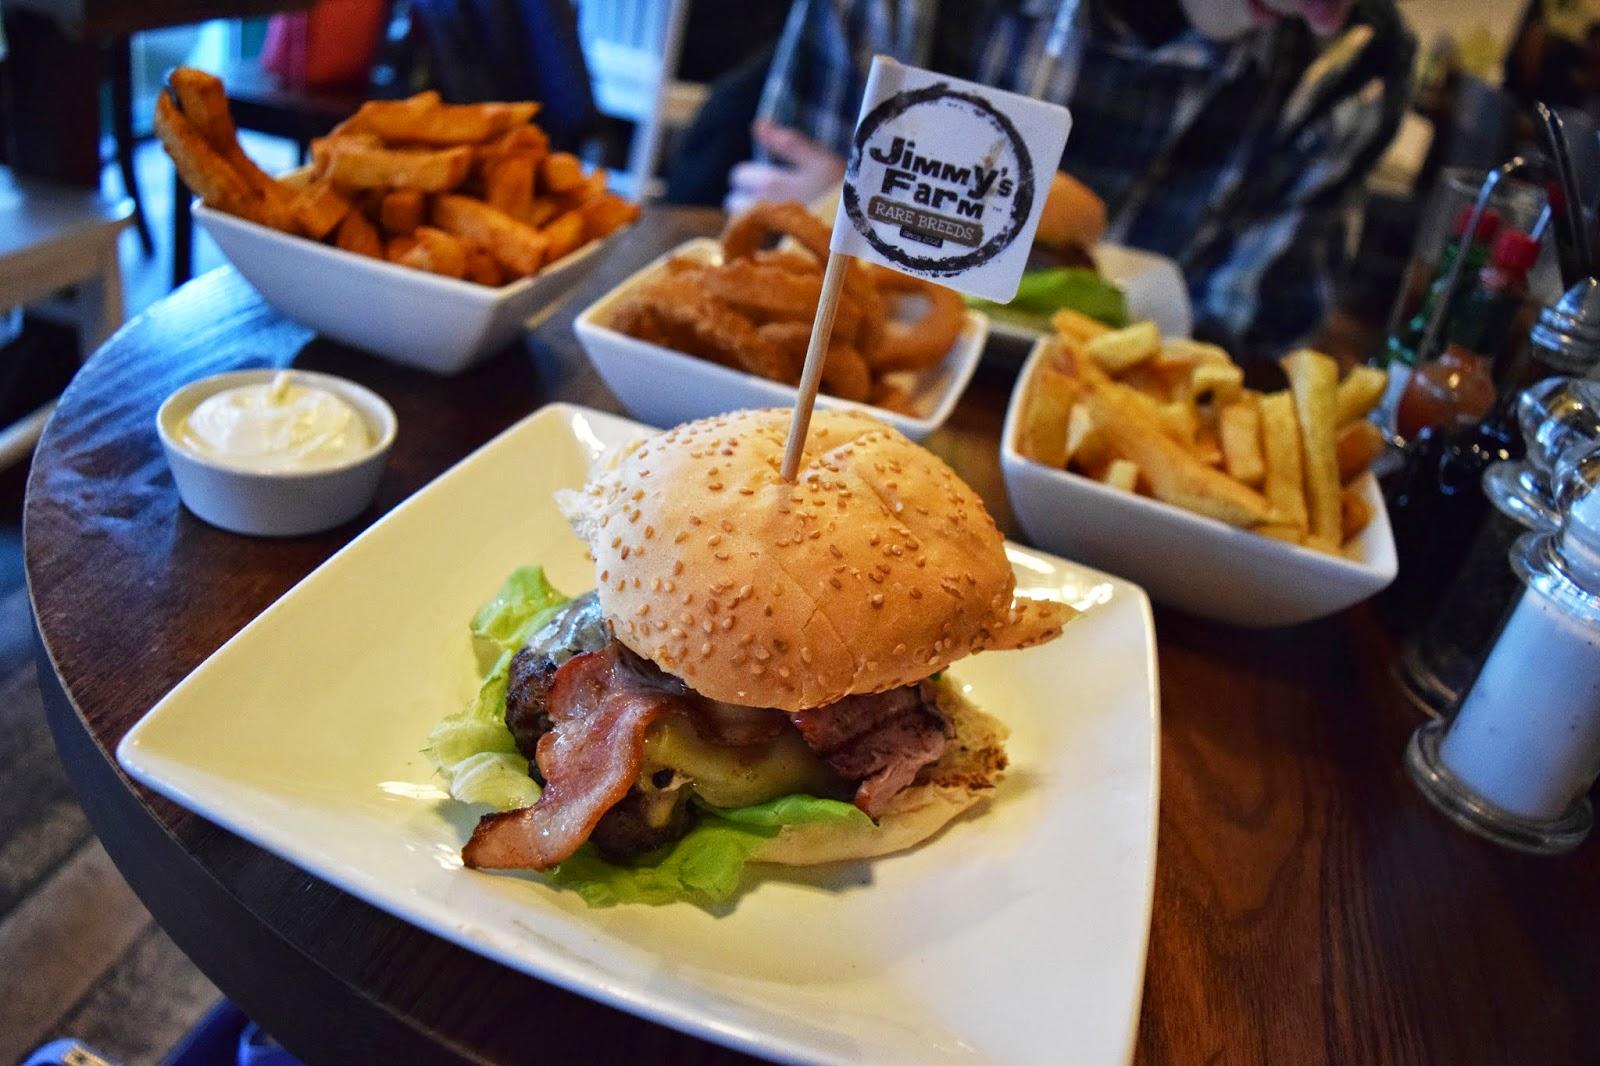 the Jimmy's Farm burger available at Handmade Burger